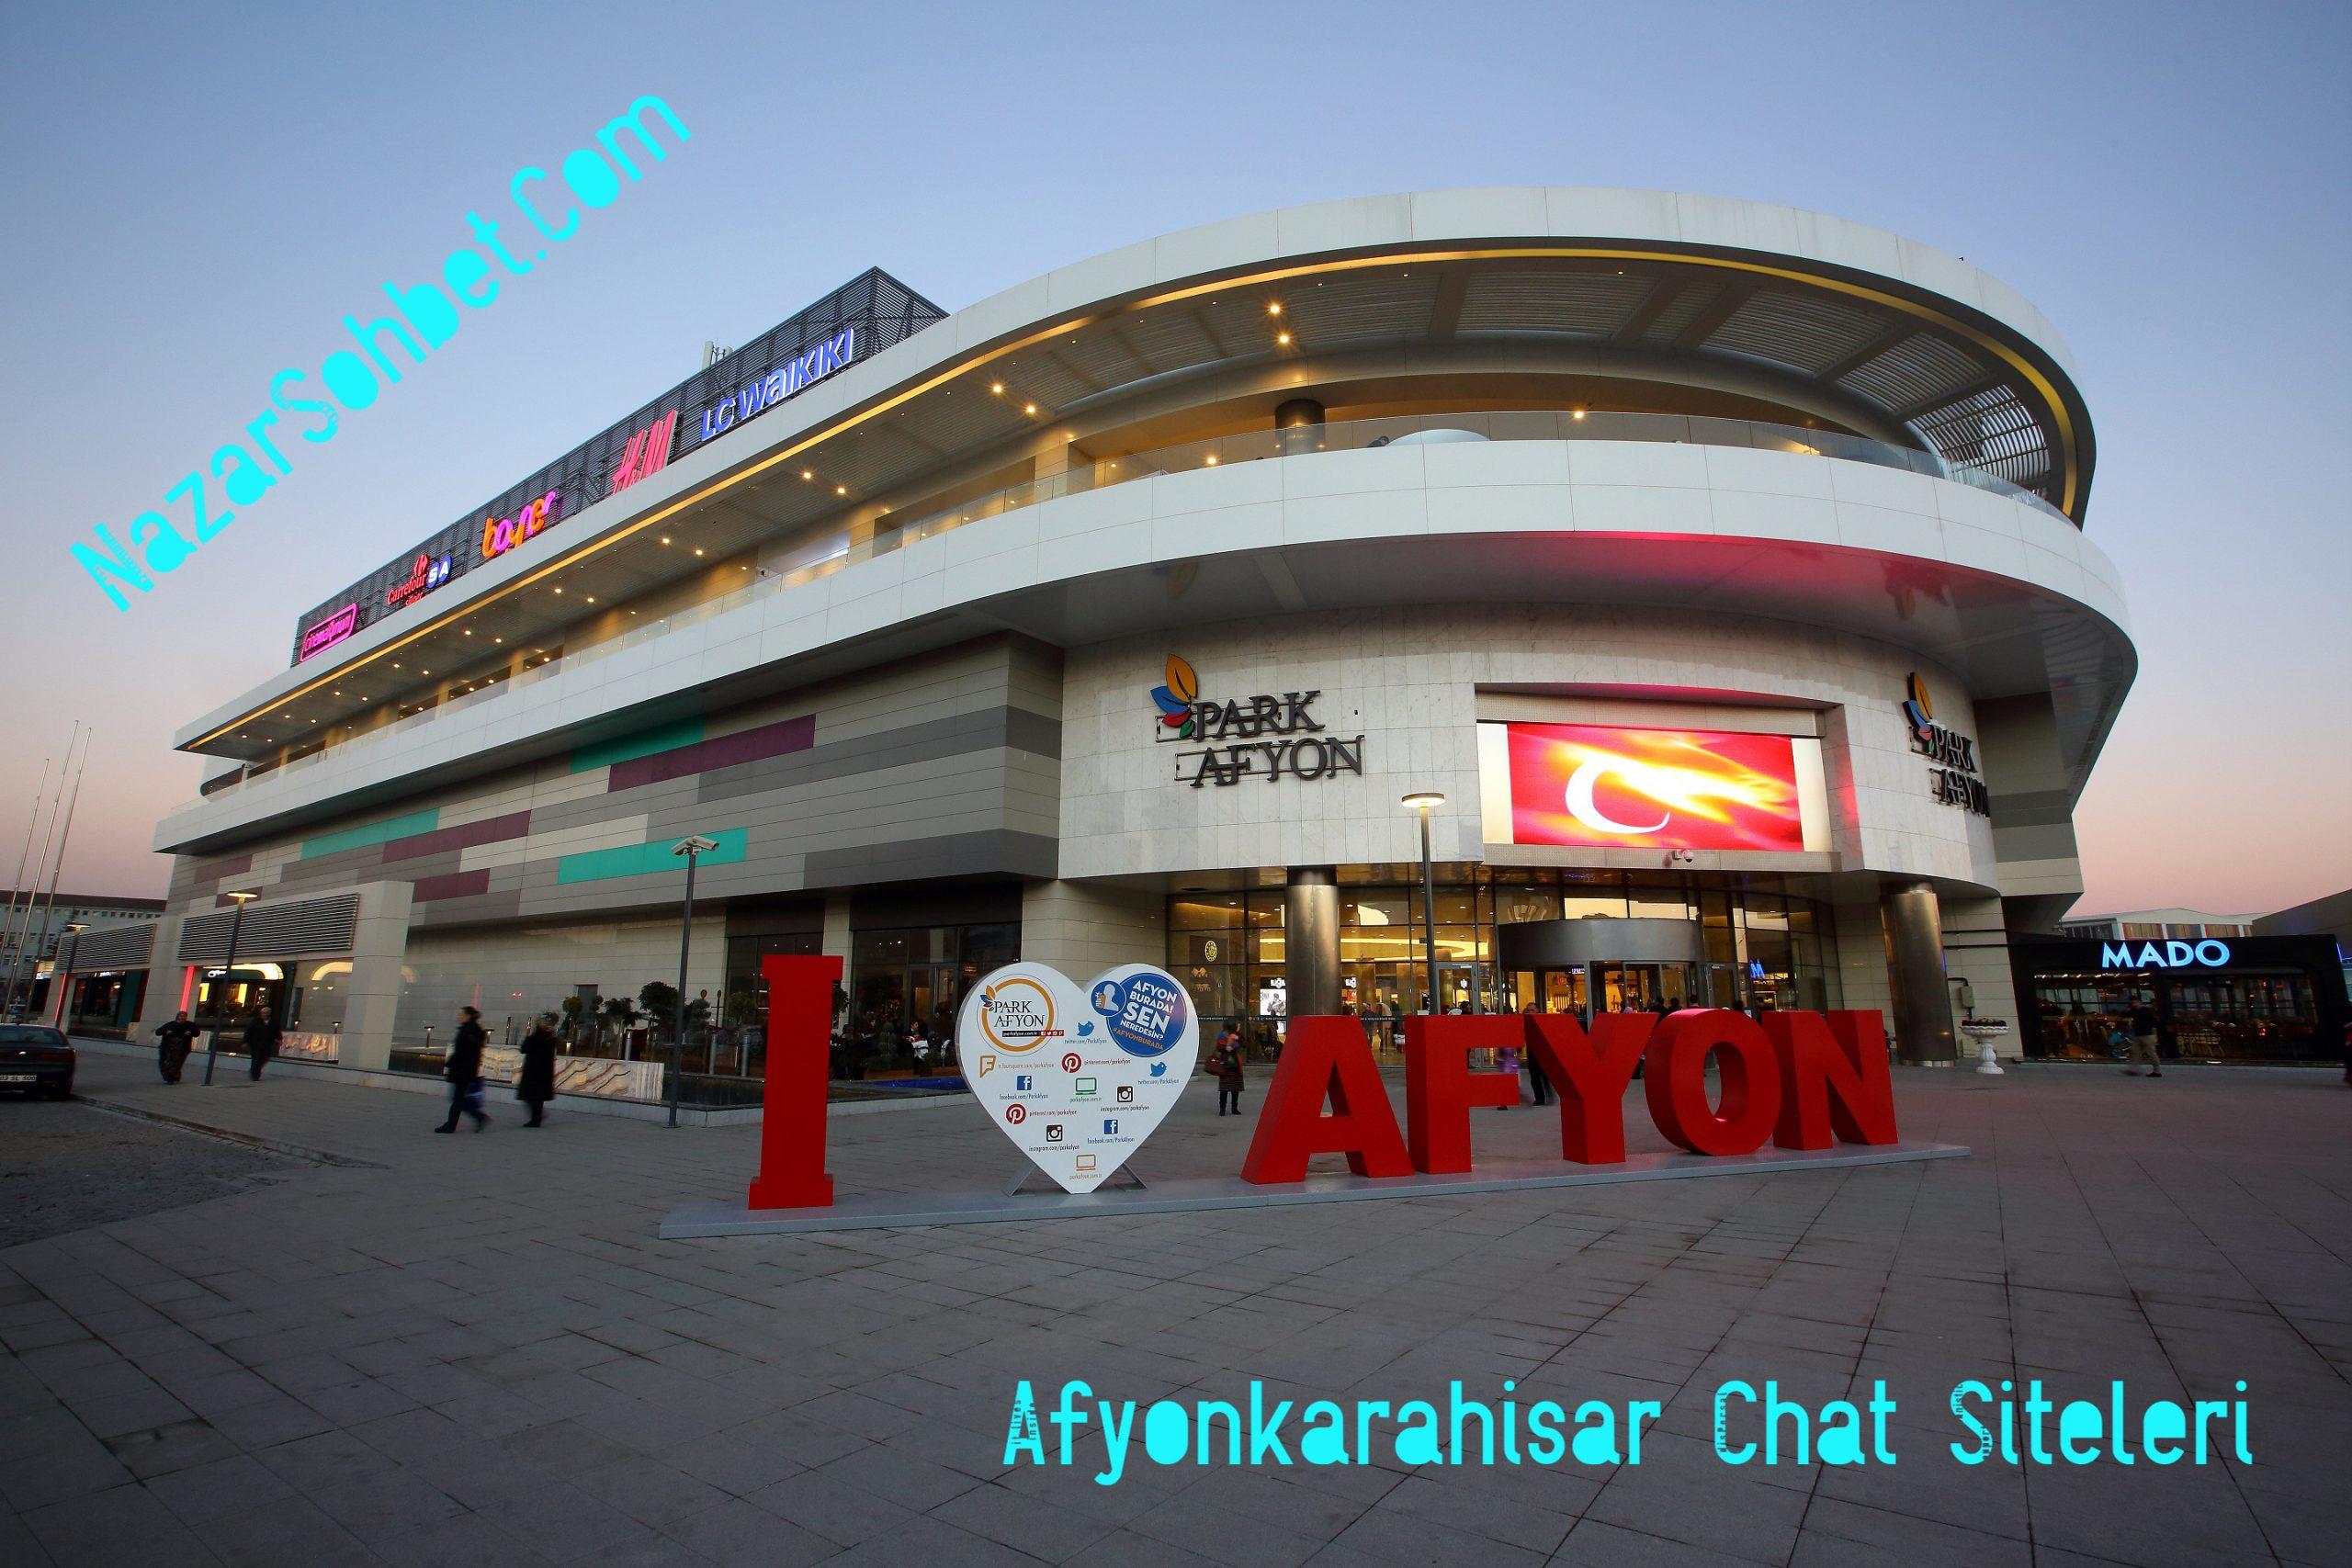 Afyonkarahisar Chat Siteleri